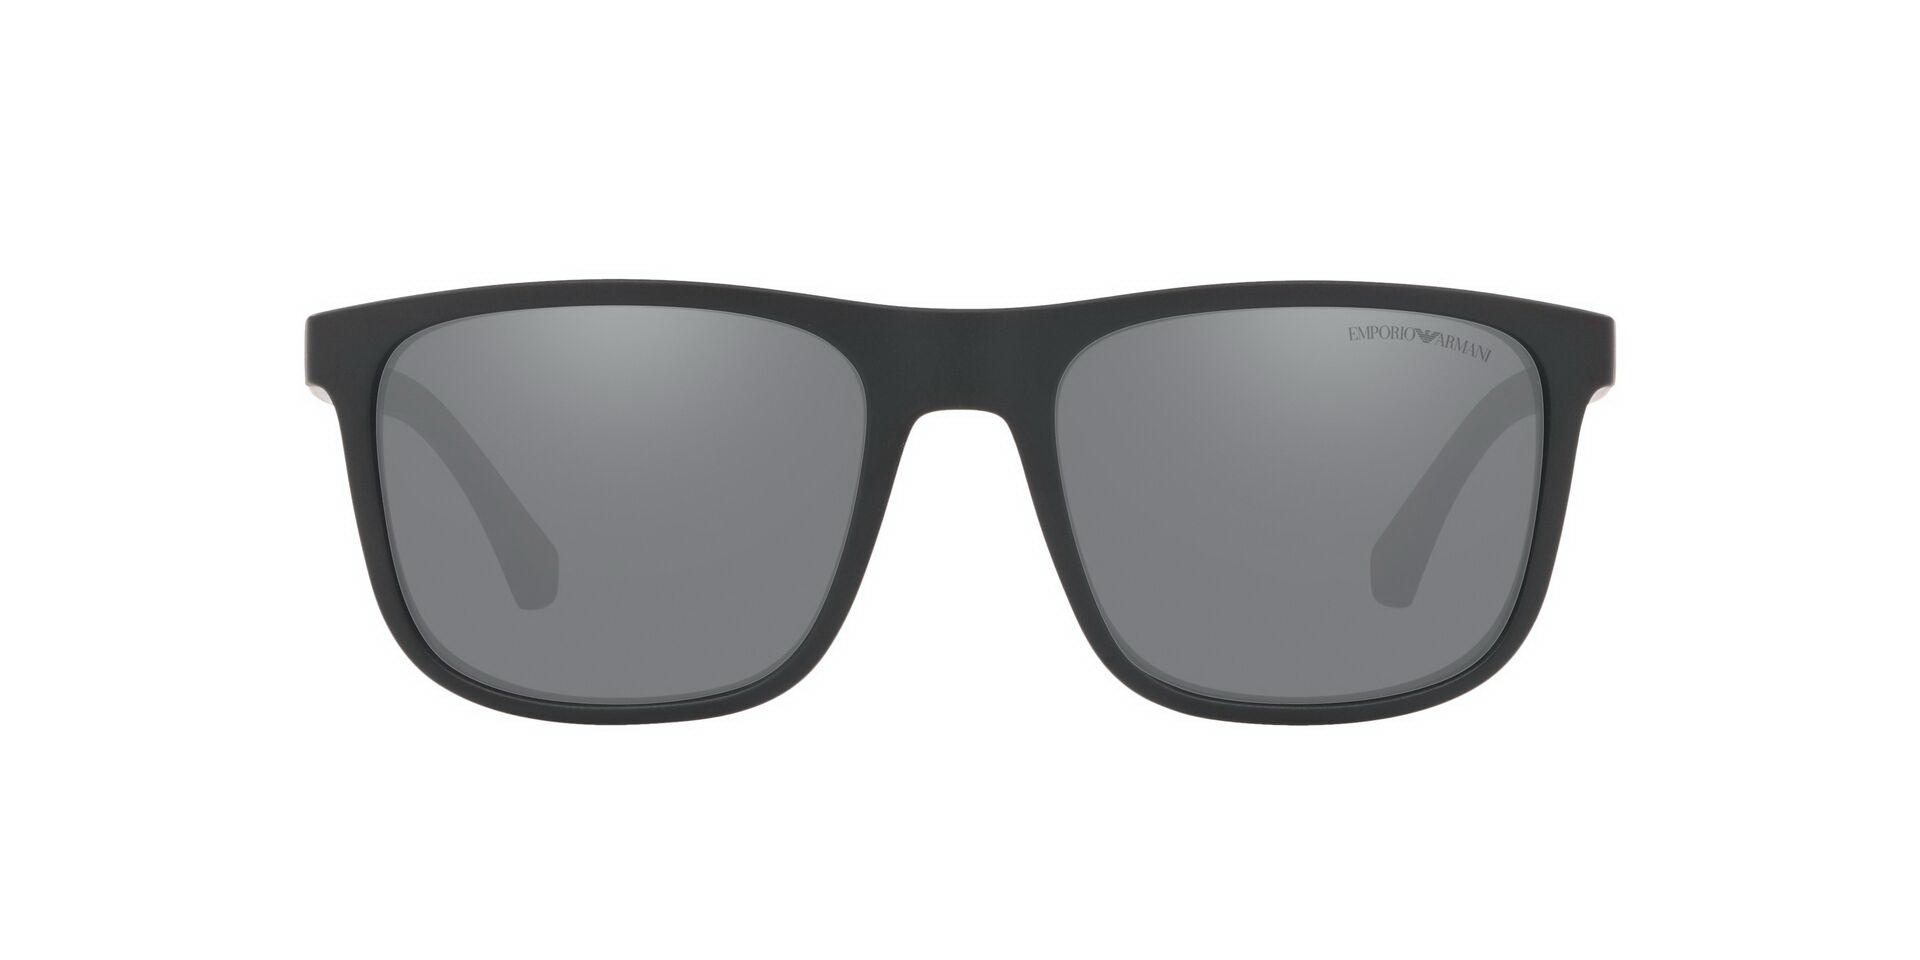 Солнцезащитные очки Очки с/з Emporio Armani 0EA4129 50016G фото